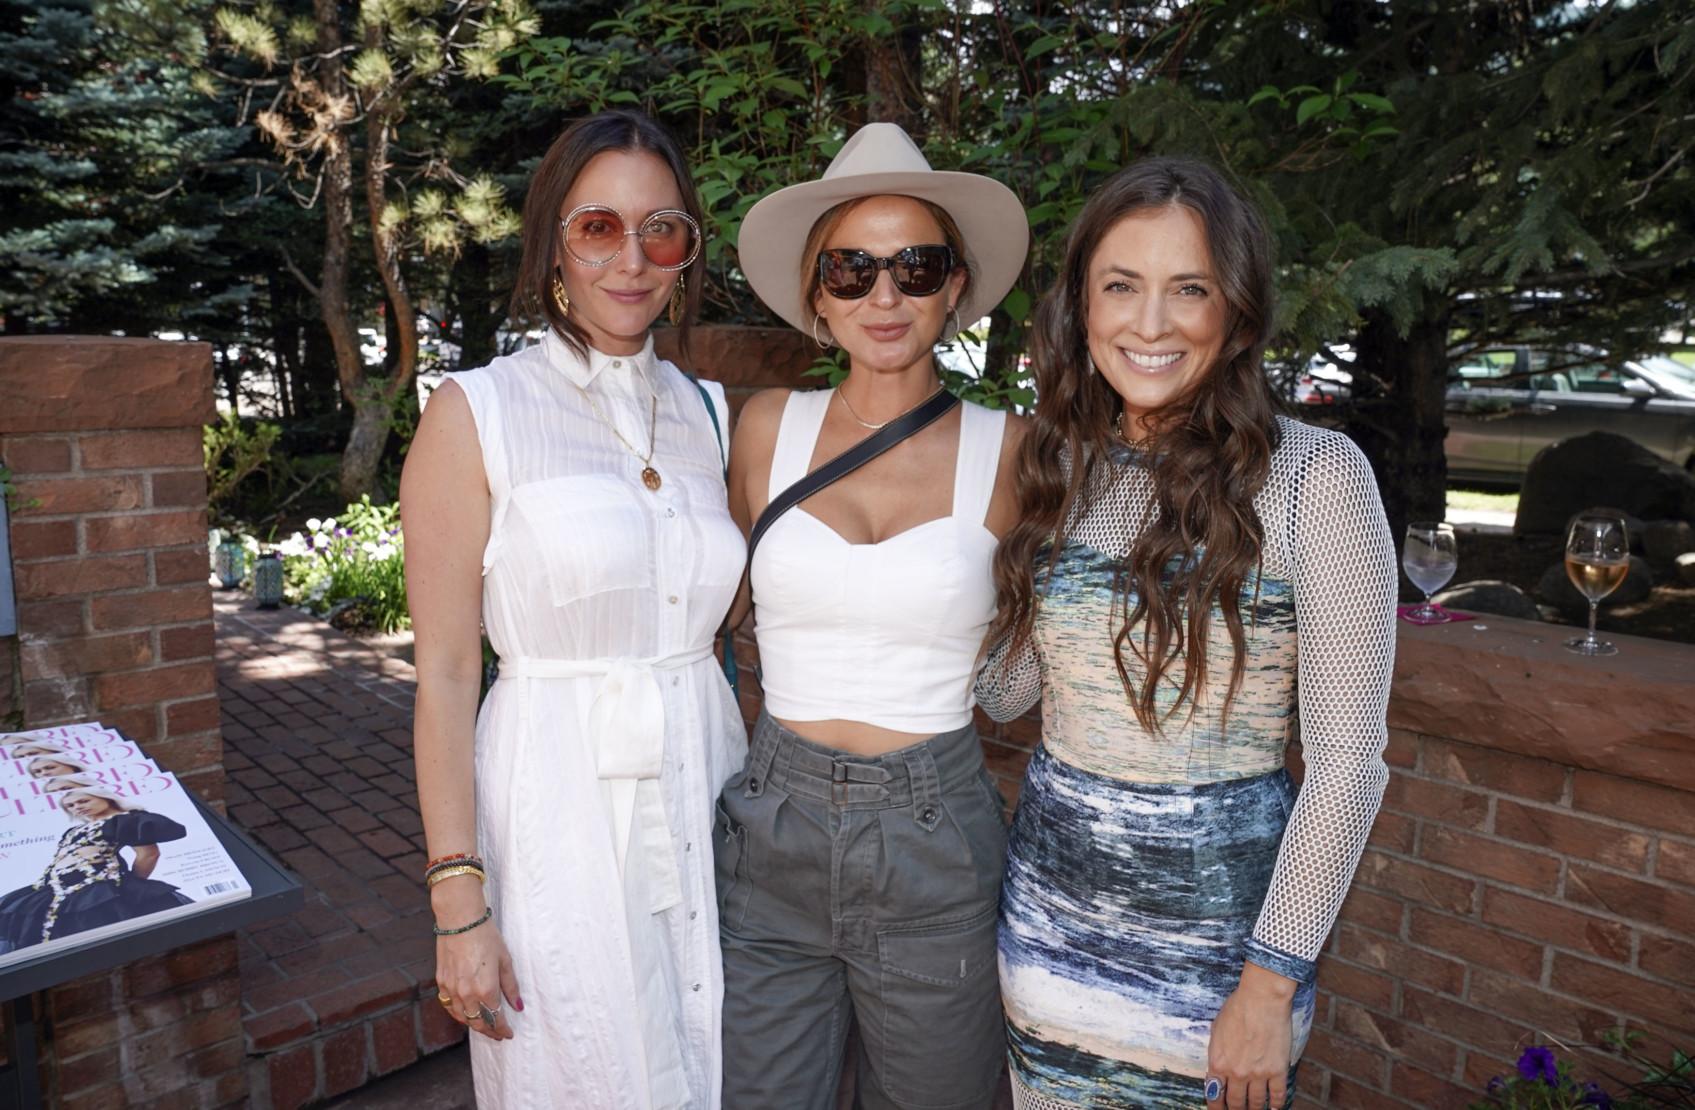 Ashlee Harrison, Evelyn Menin and Ashley Wein.